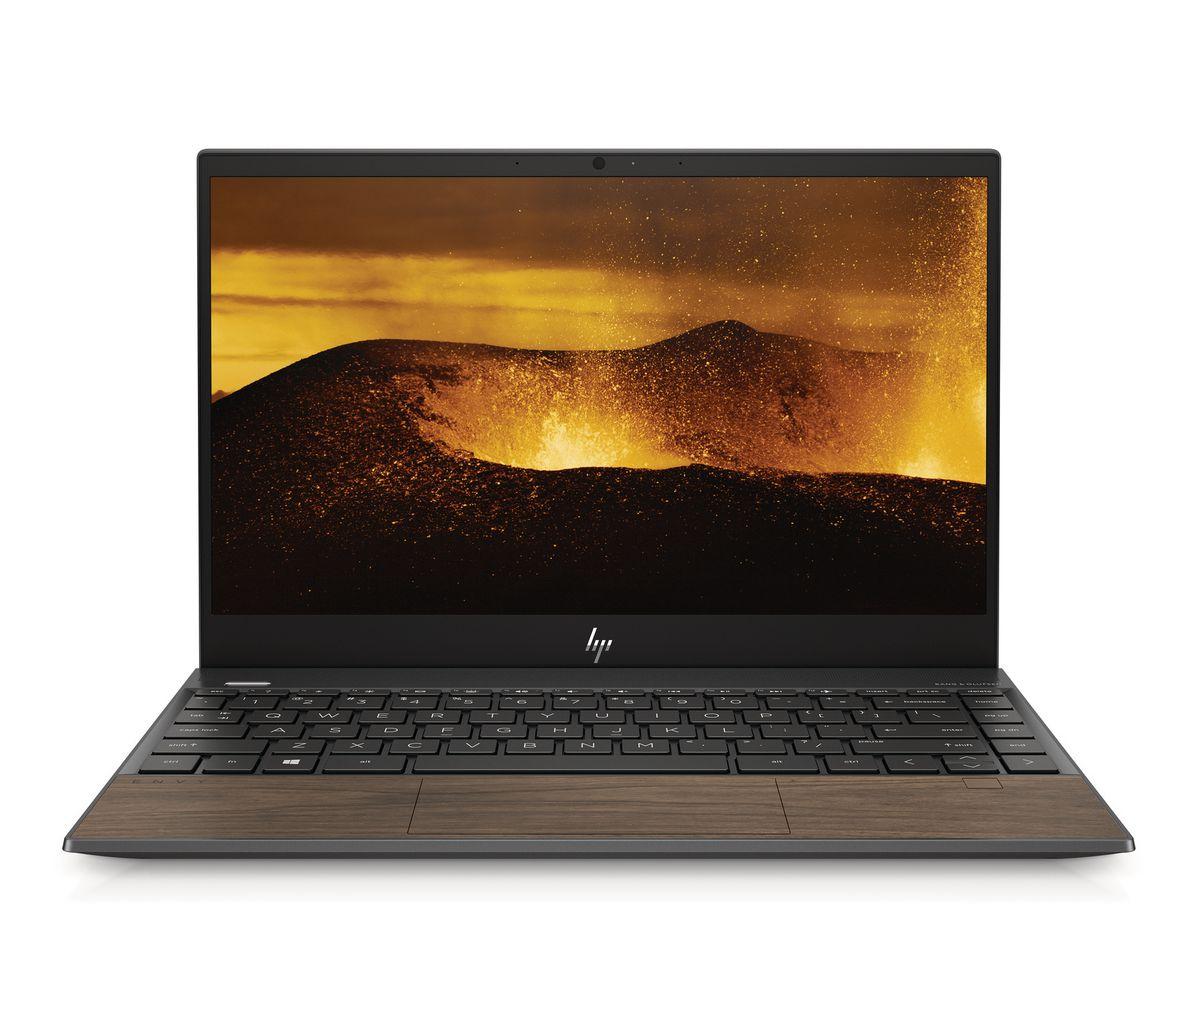 hp-envy-wood-variants-laptops